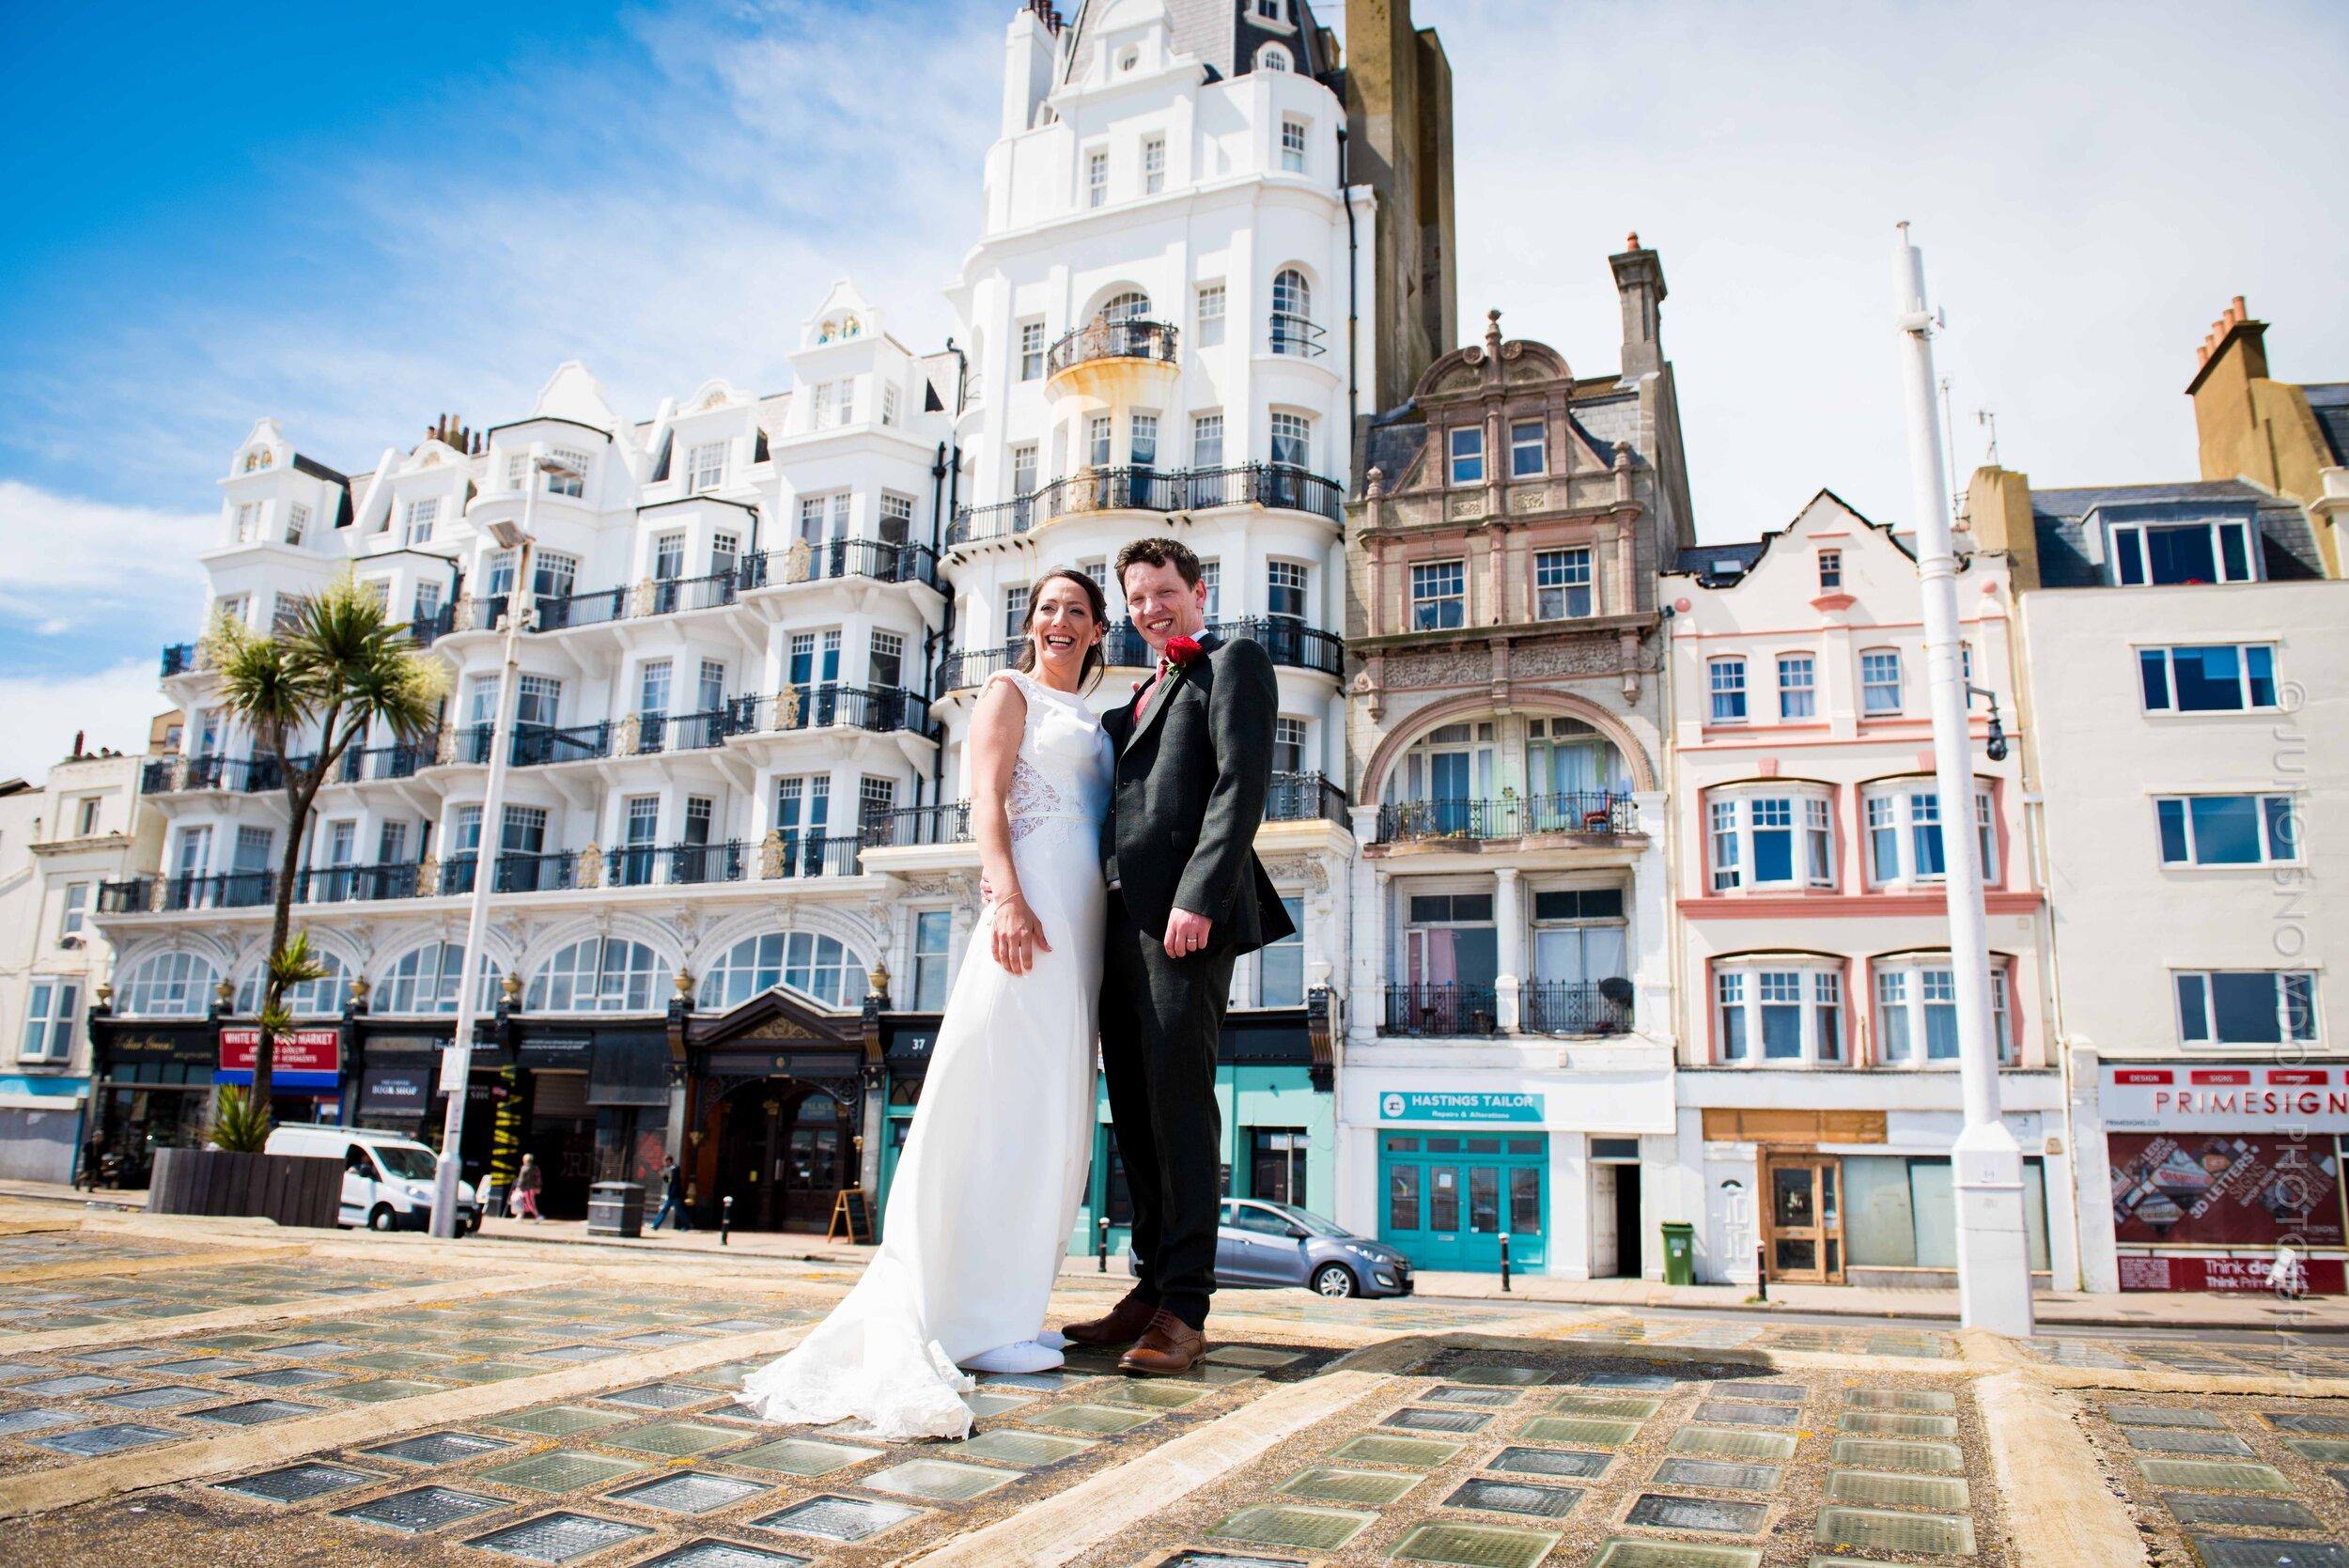 juno-snowdon-photography-wedding-7457.jpg